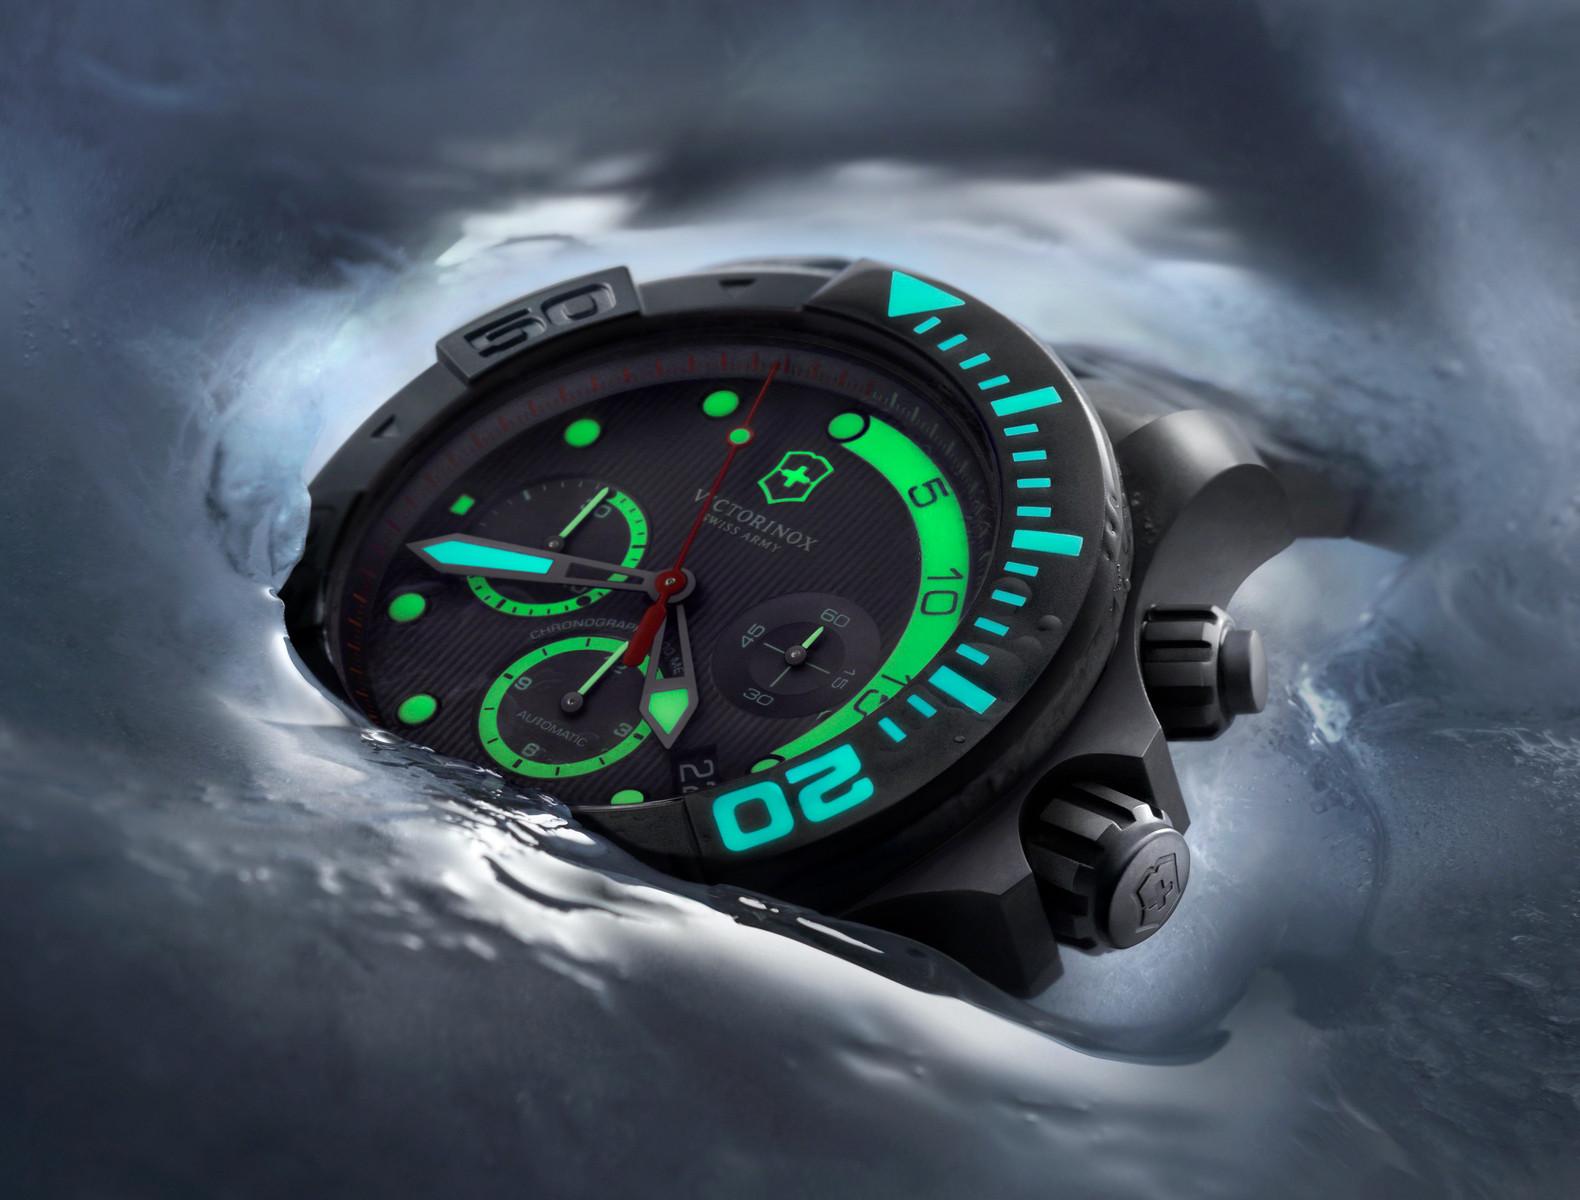 Victorinox Dive Master 500 Chronograph Limited Edition